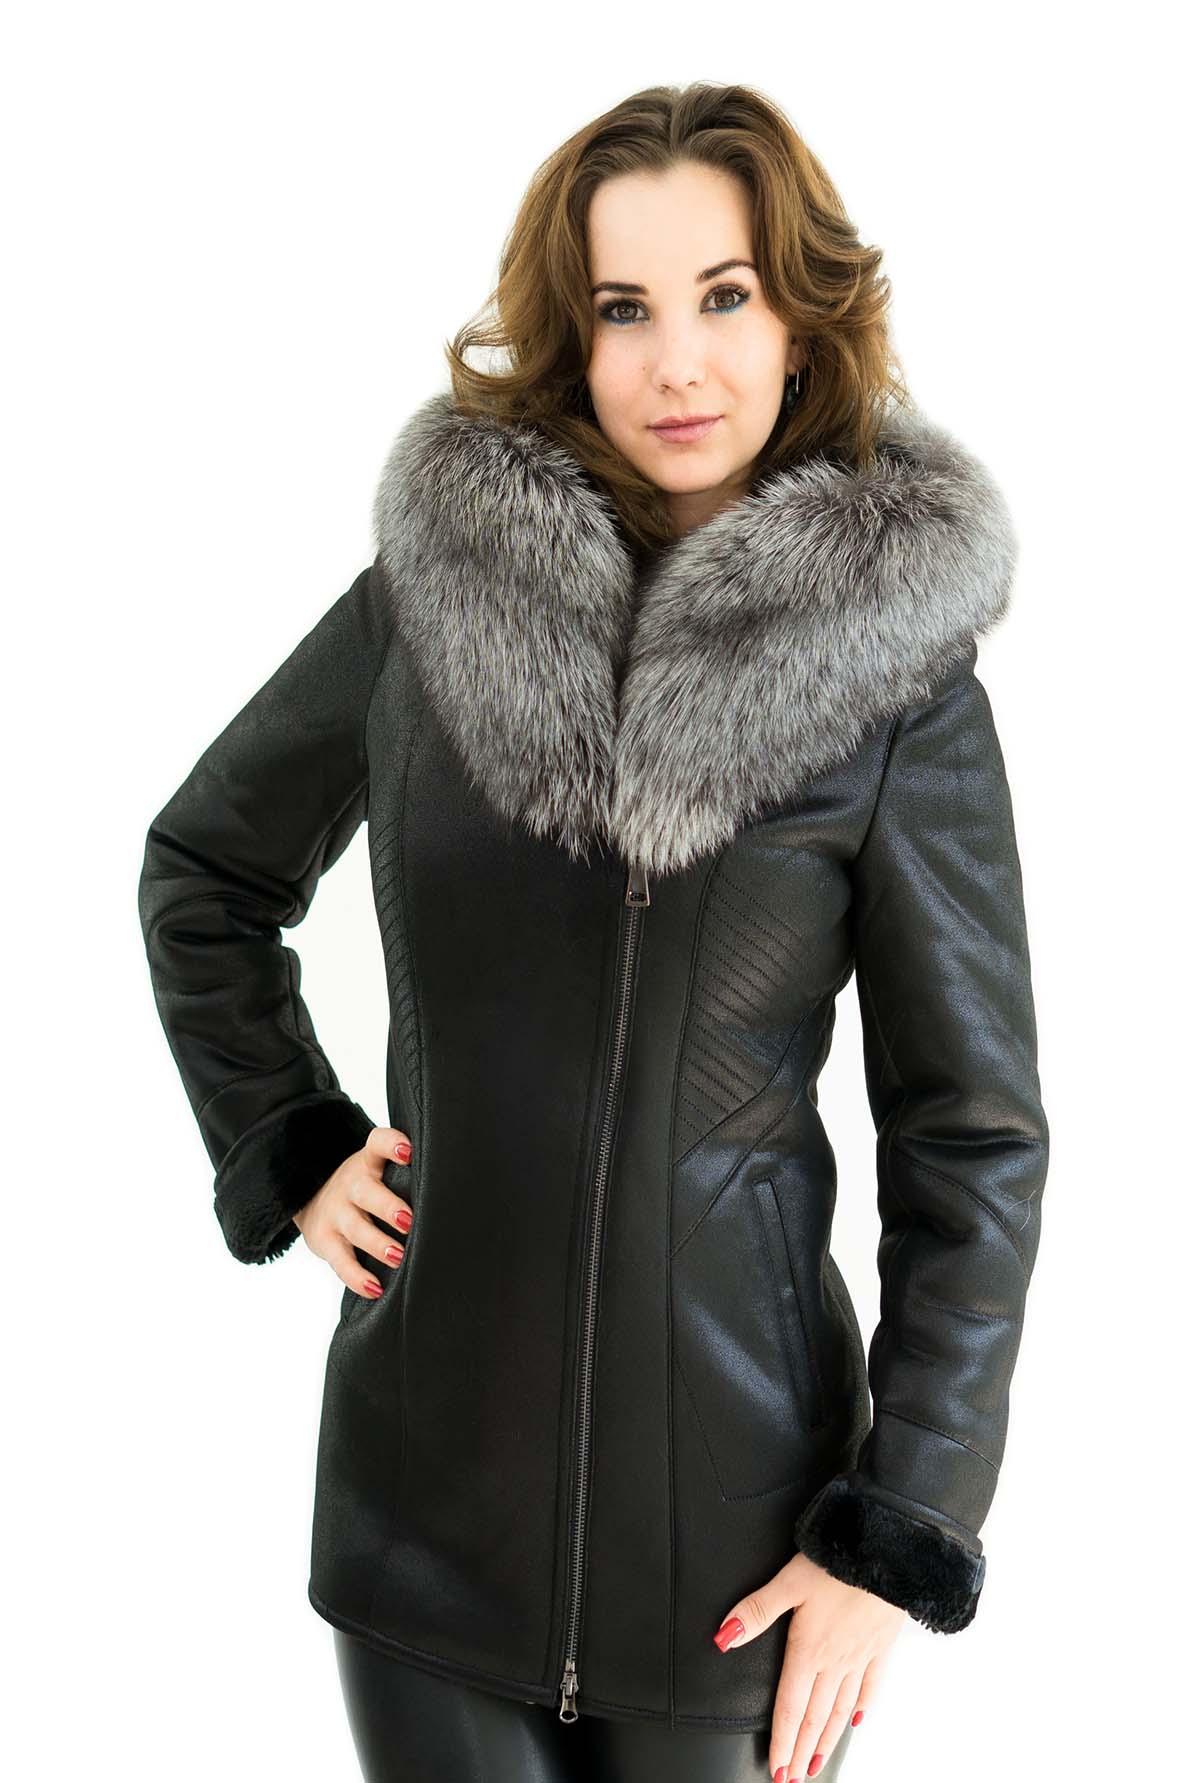 winterjacke wintermantel sarah mit pelzkragen pelzchen mode. Black Bedroom Furniture Sets. Home Design Ideas